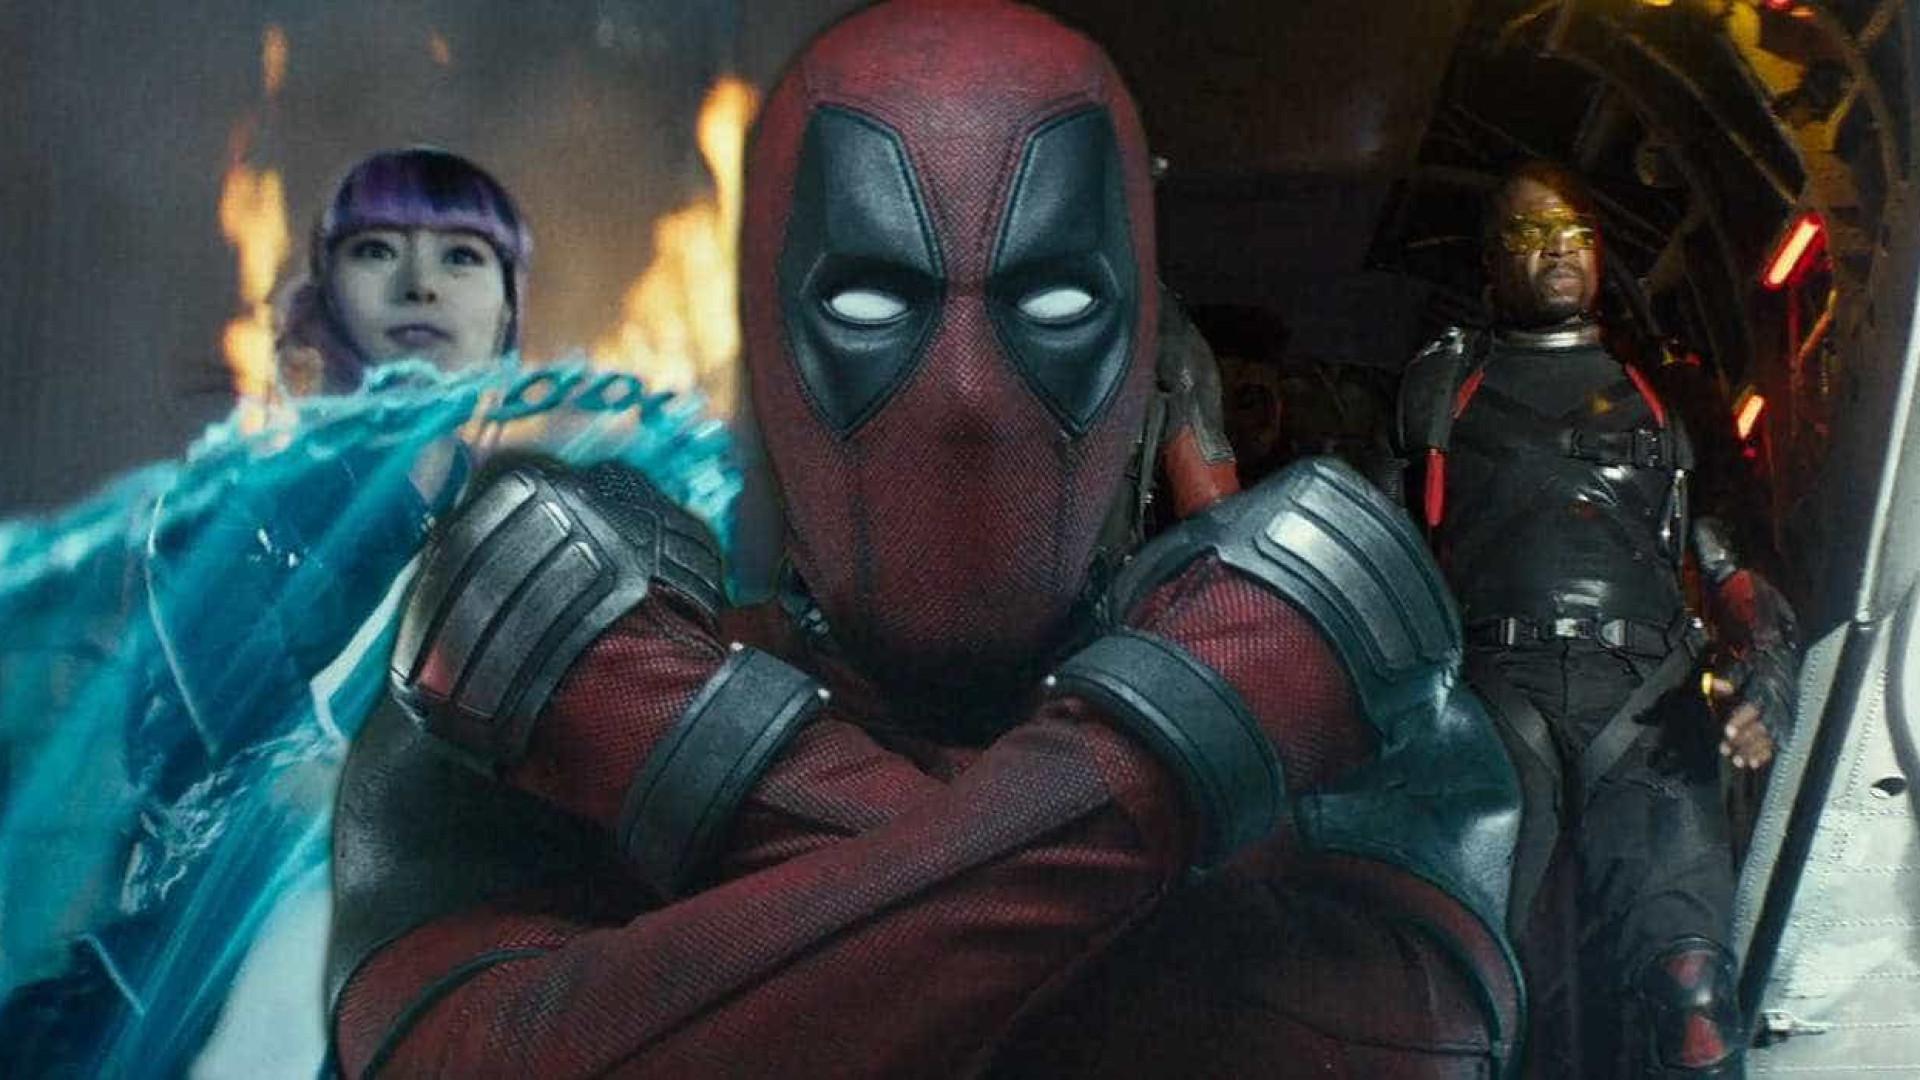 Deadpool 2 chega aos cinemas ainda mais audacioso e destemido